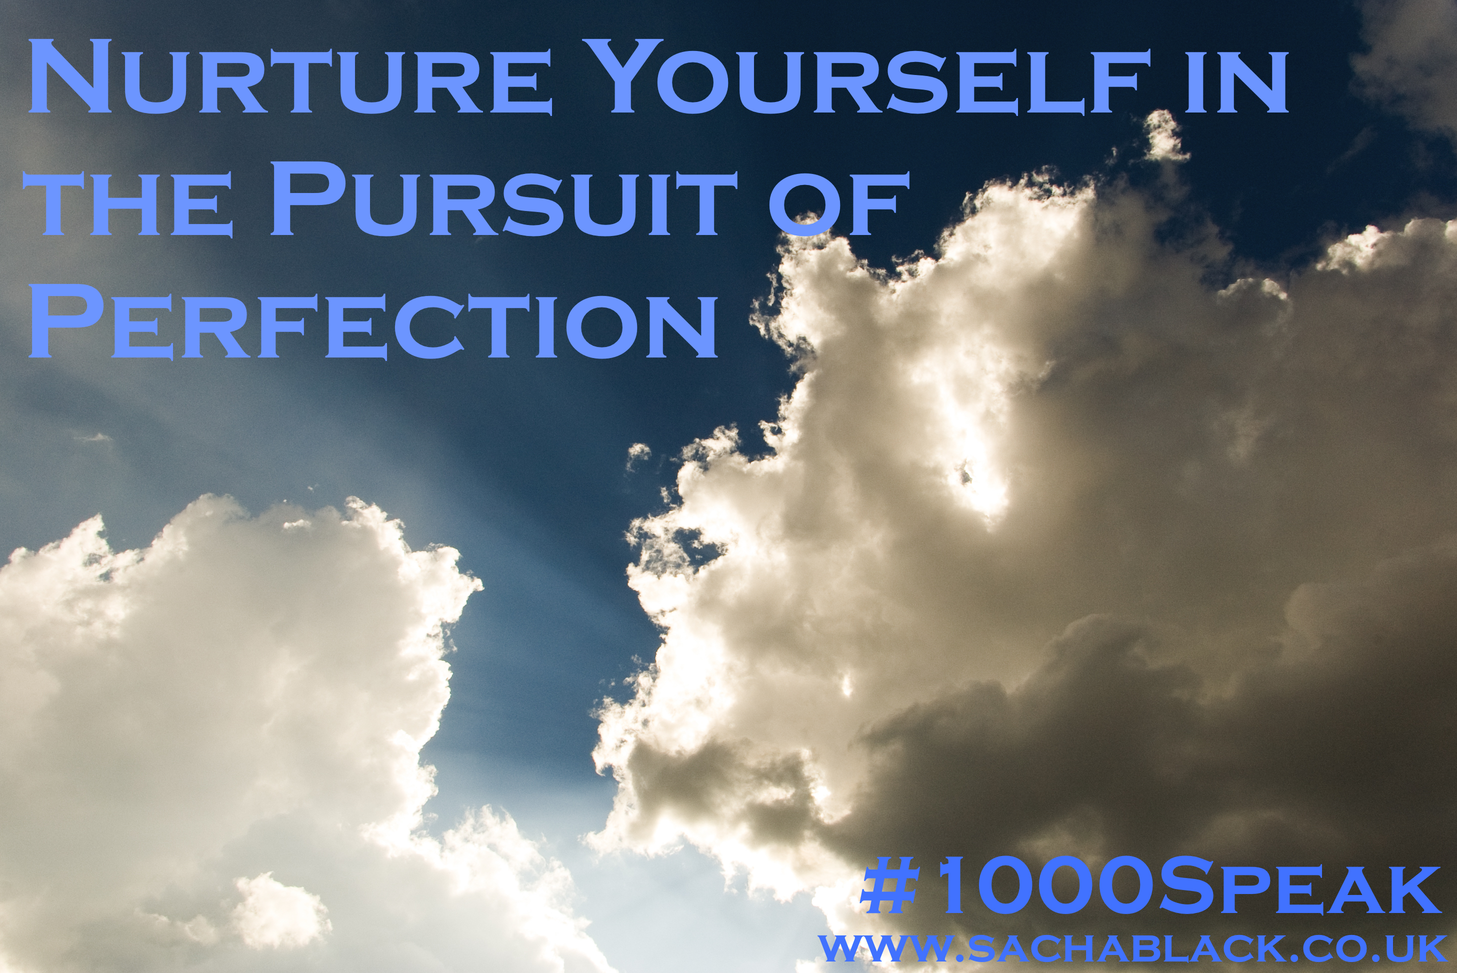 Nurture Yourself in The Pursuit of Perfection #1000speak